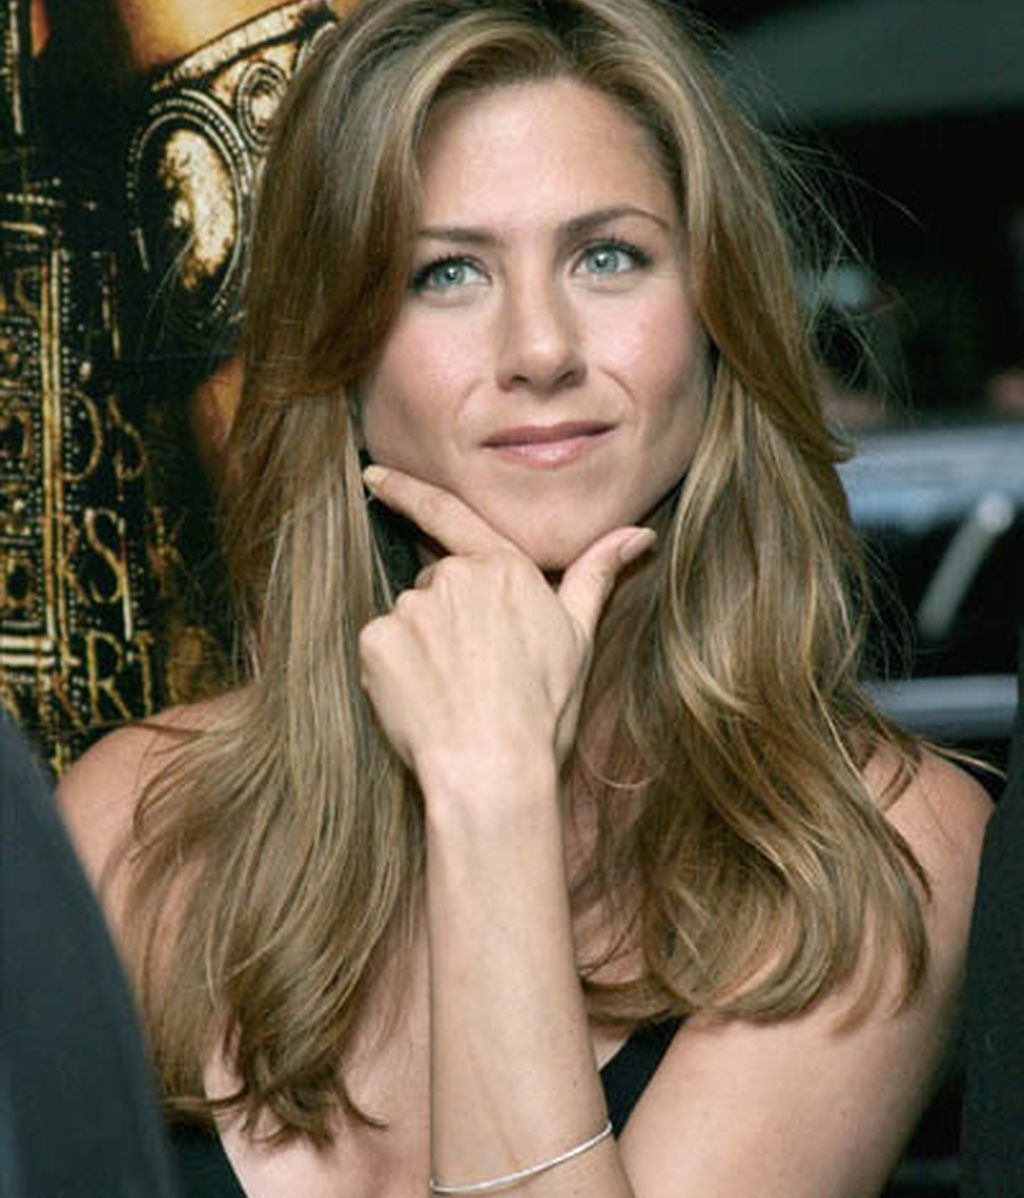 Jennifer con 35 años